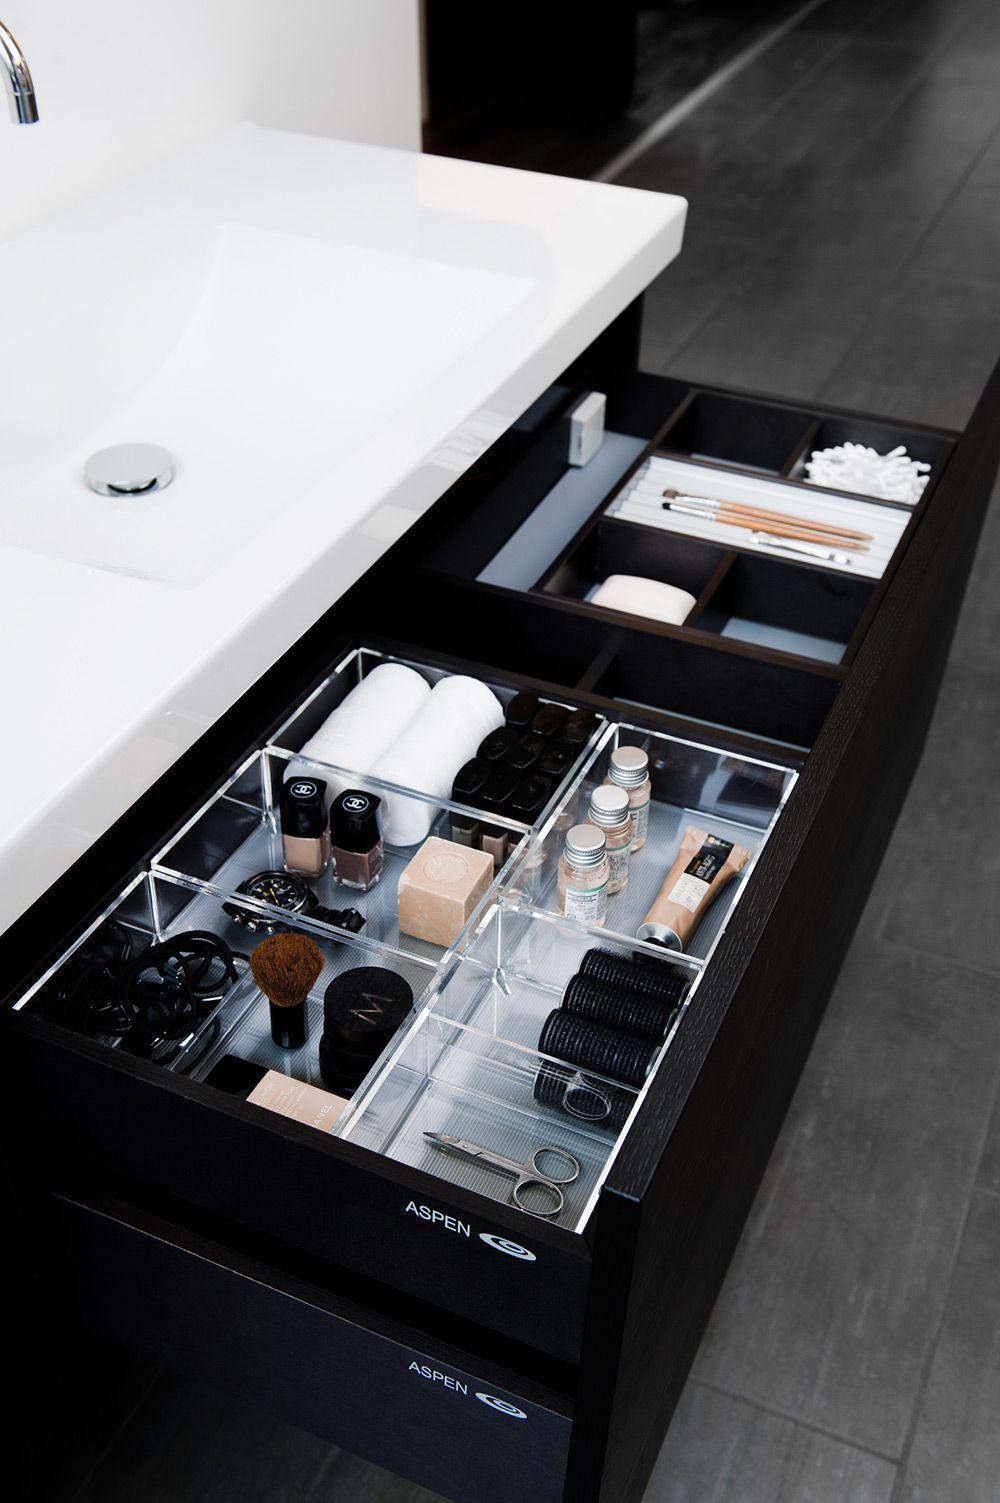 Kitchen Sink Organisers Uk